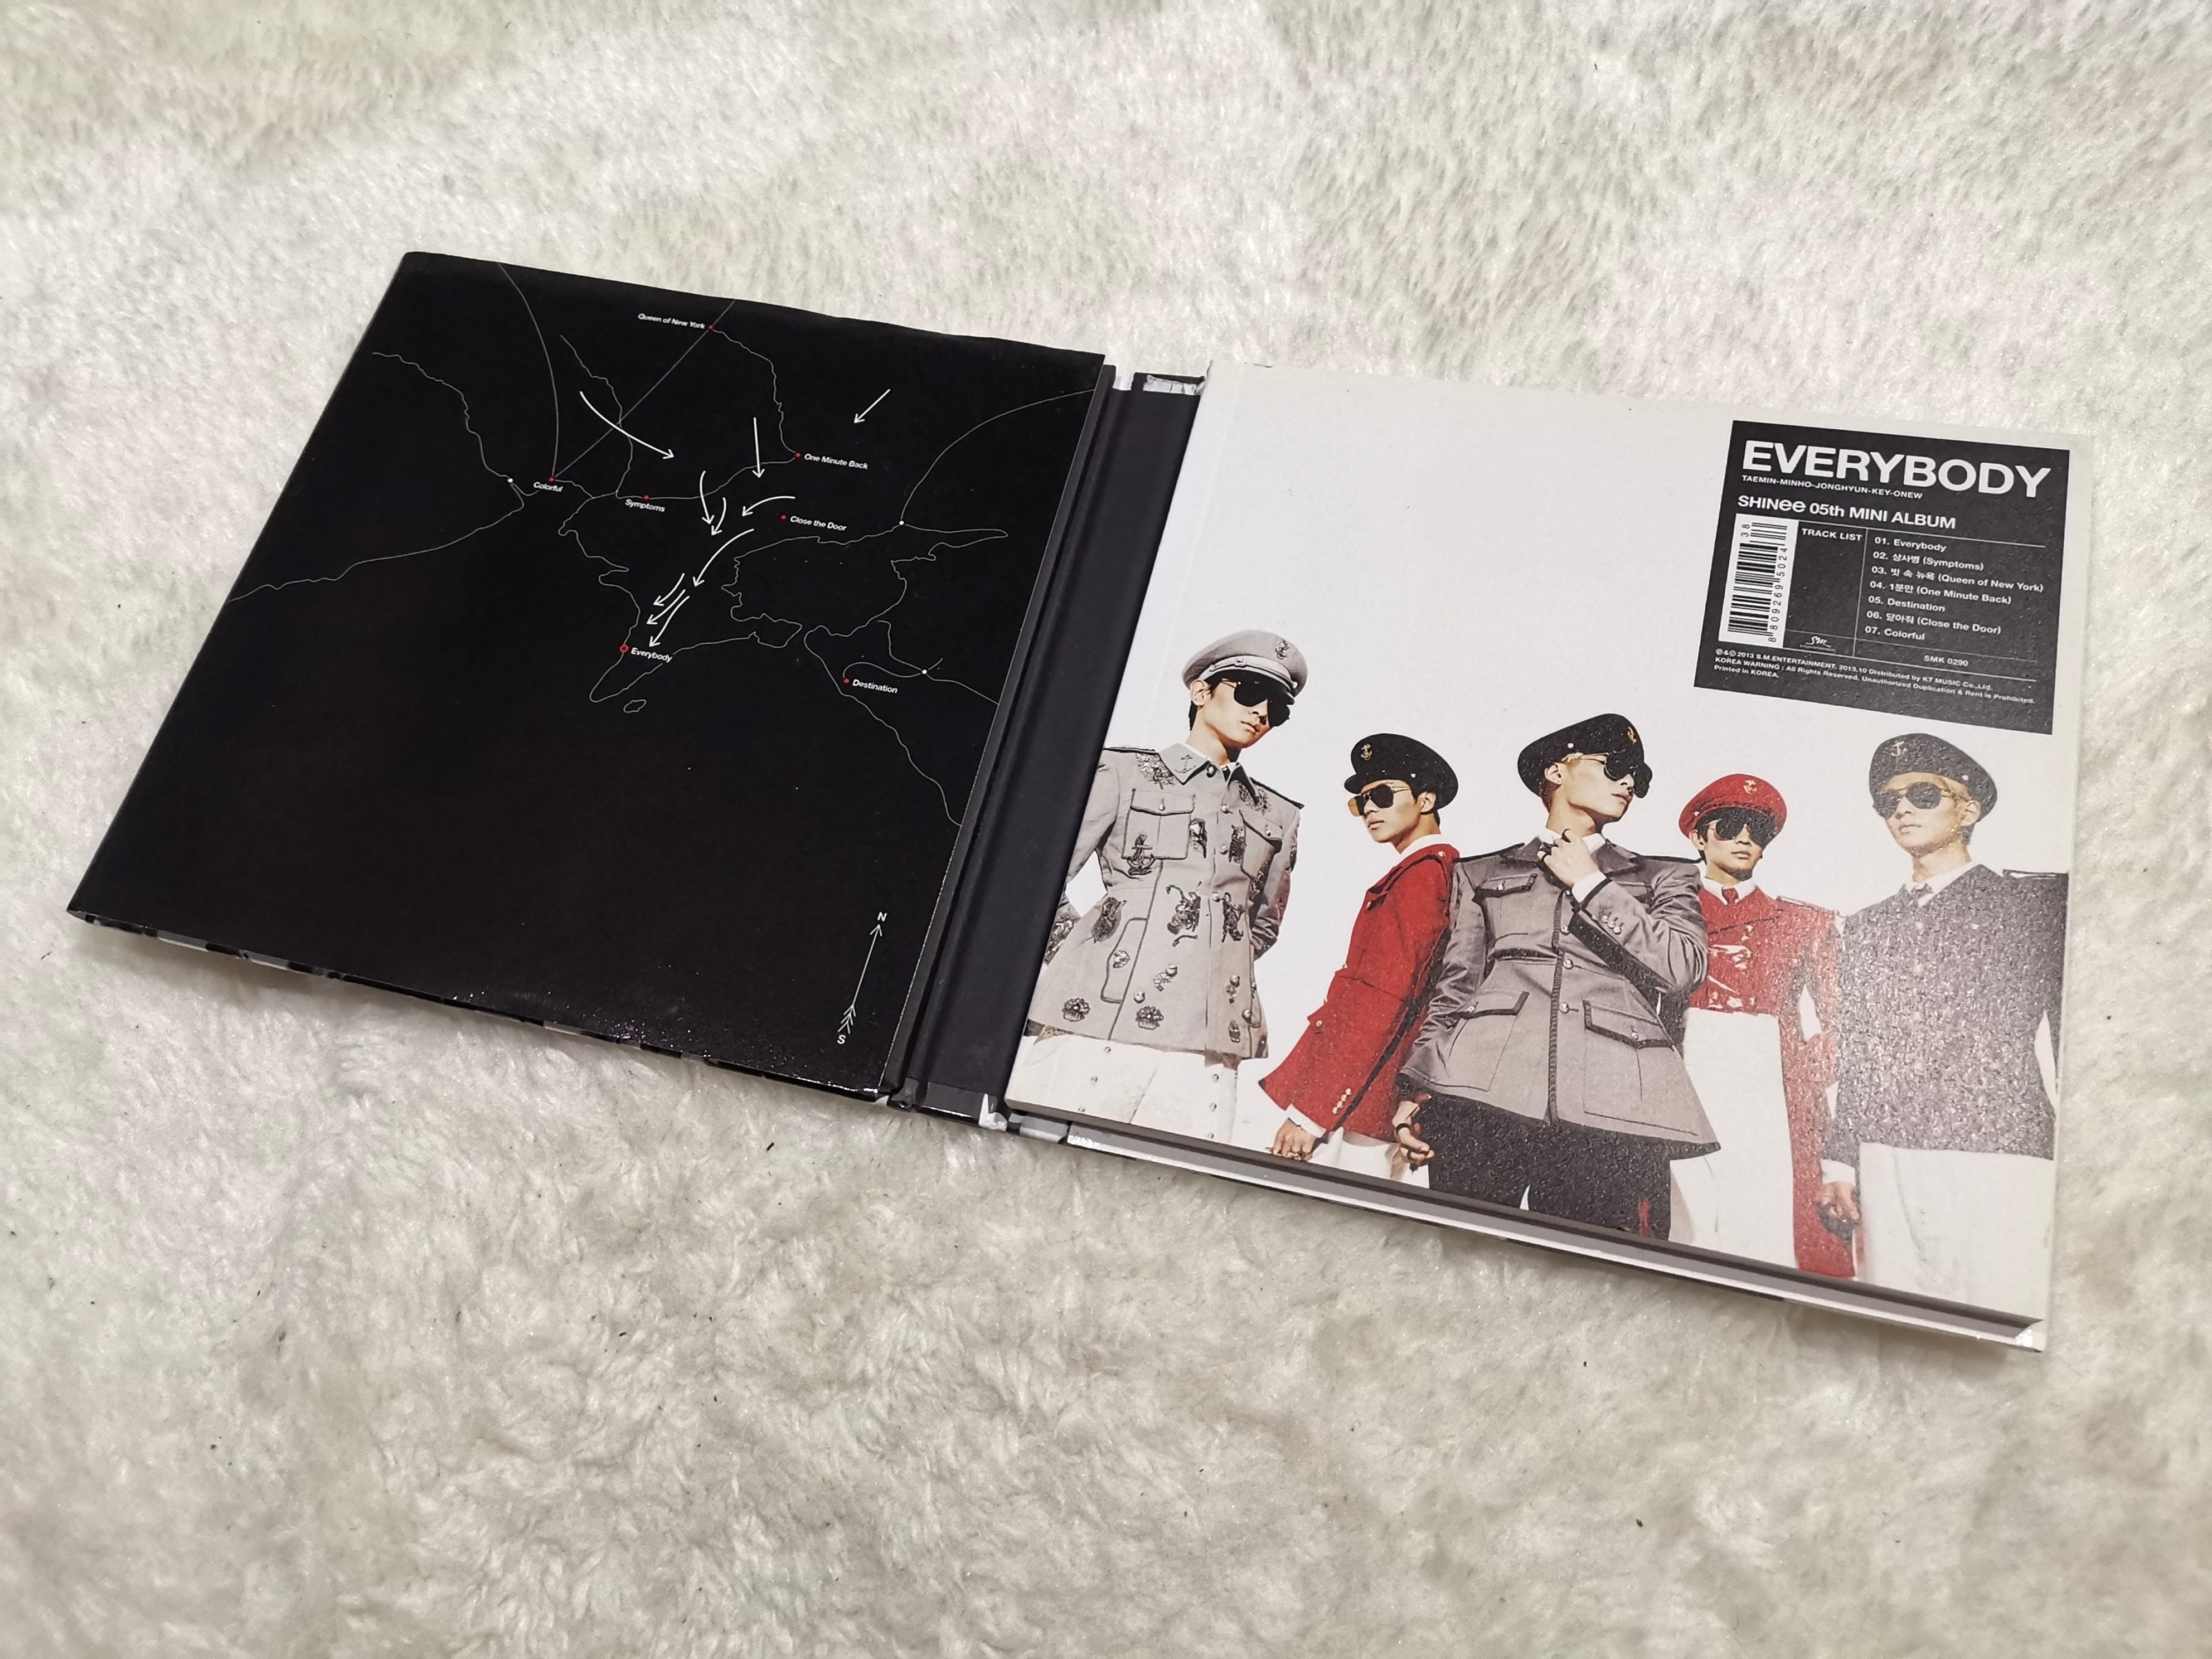 [FREE POSTERS] SHINEE ALBUM EVERYBODY // 5TH MINI ALBUM